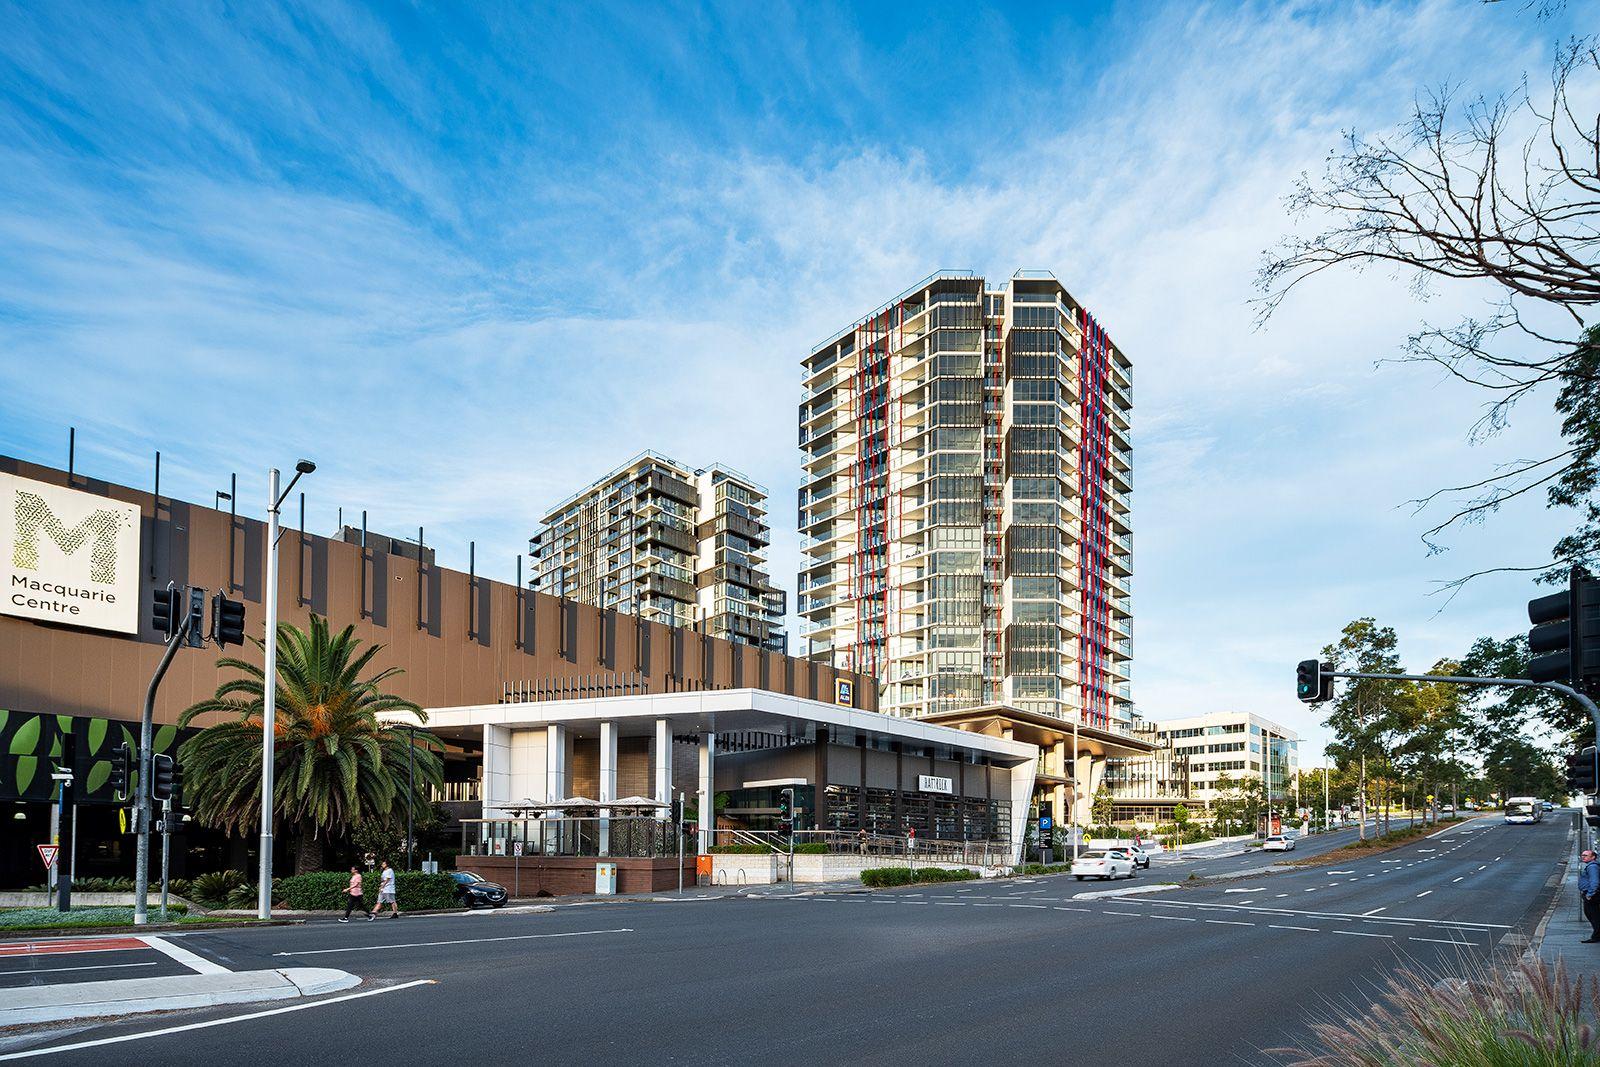 101 Waterloo Road, Macquarie Park, NSW 2113, Image 0